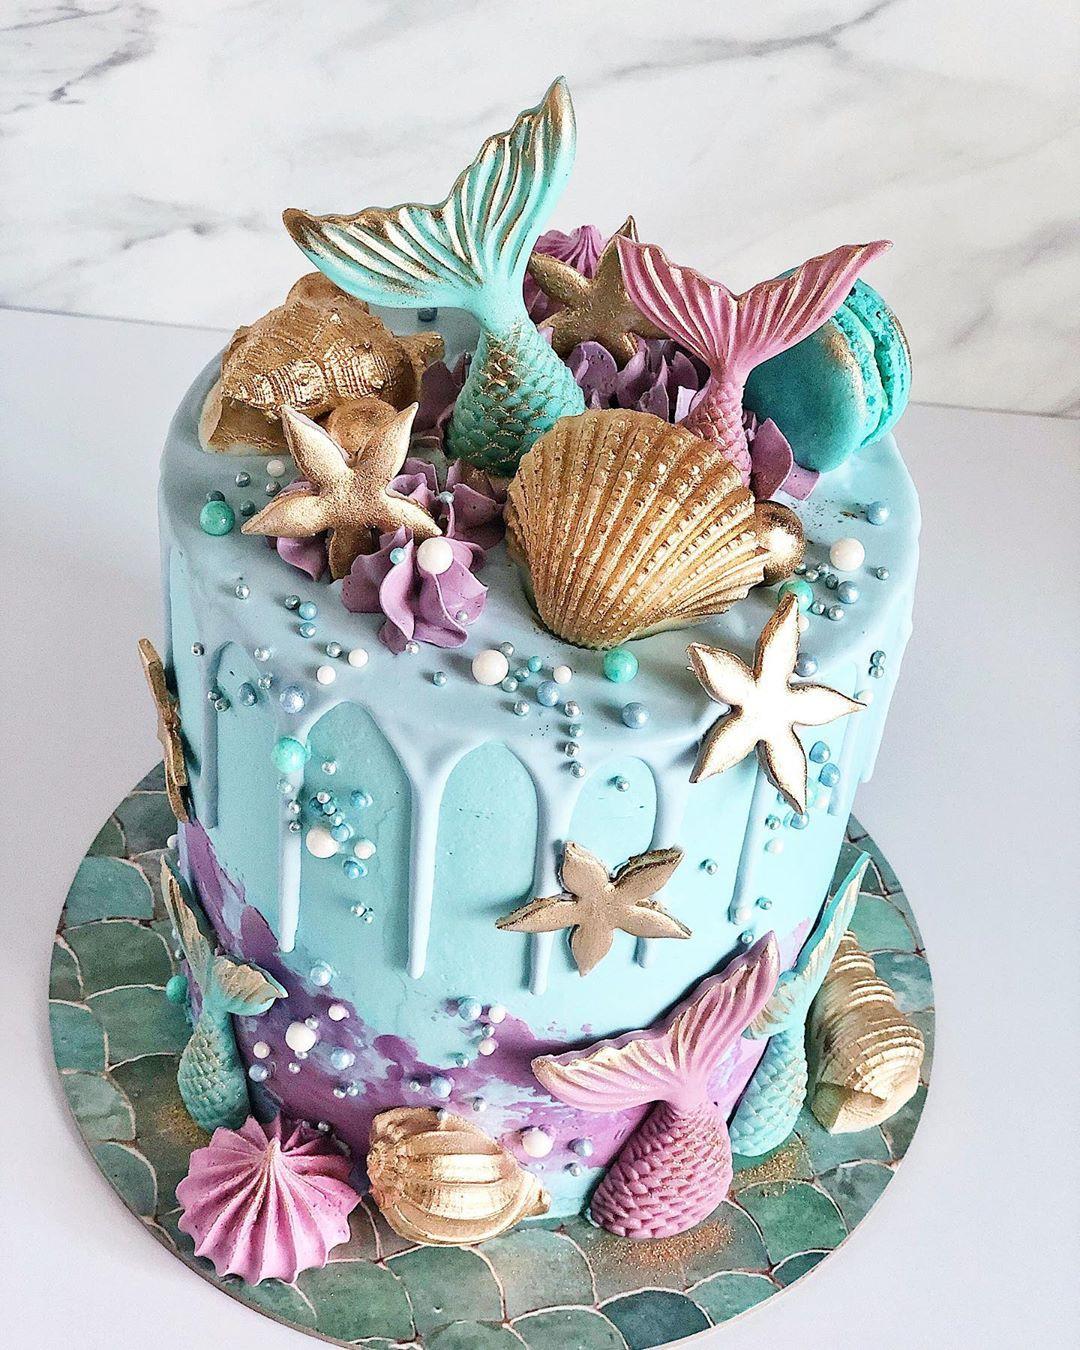 52 Mermaid Cakes Ideas You Are Sure to Love,mermaid cake ideas sheet cake,mermaid cake party ideas,mermaid cake template